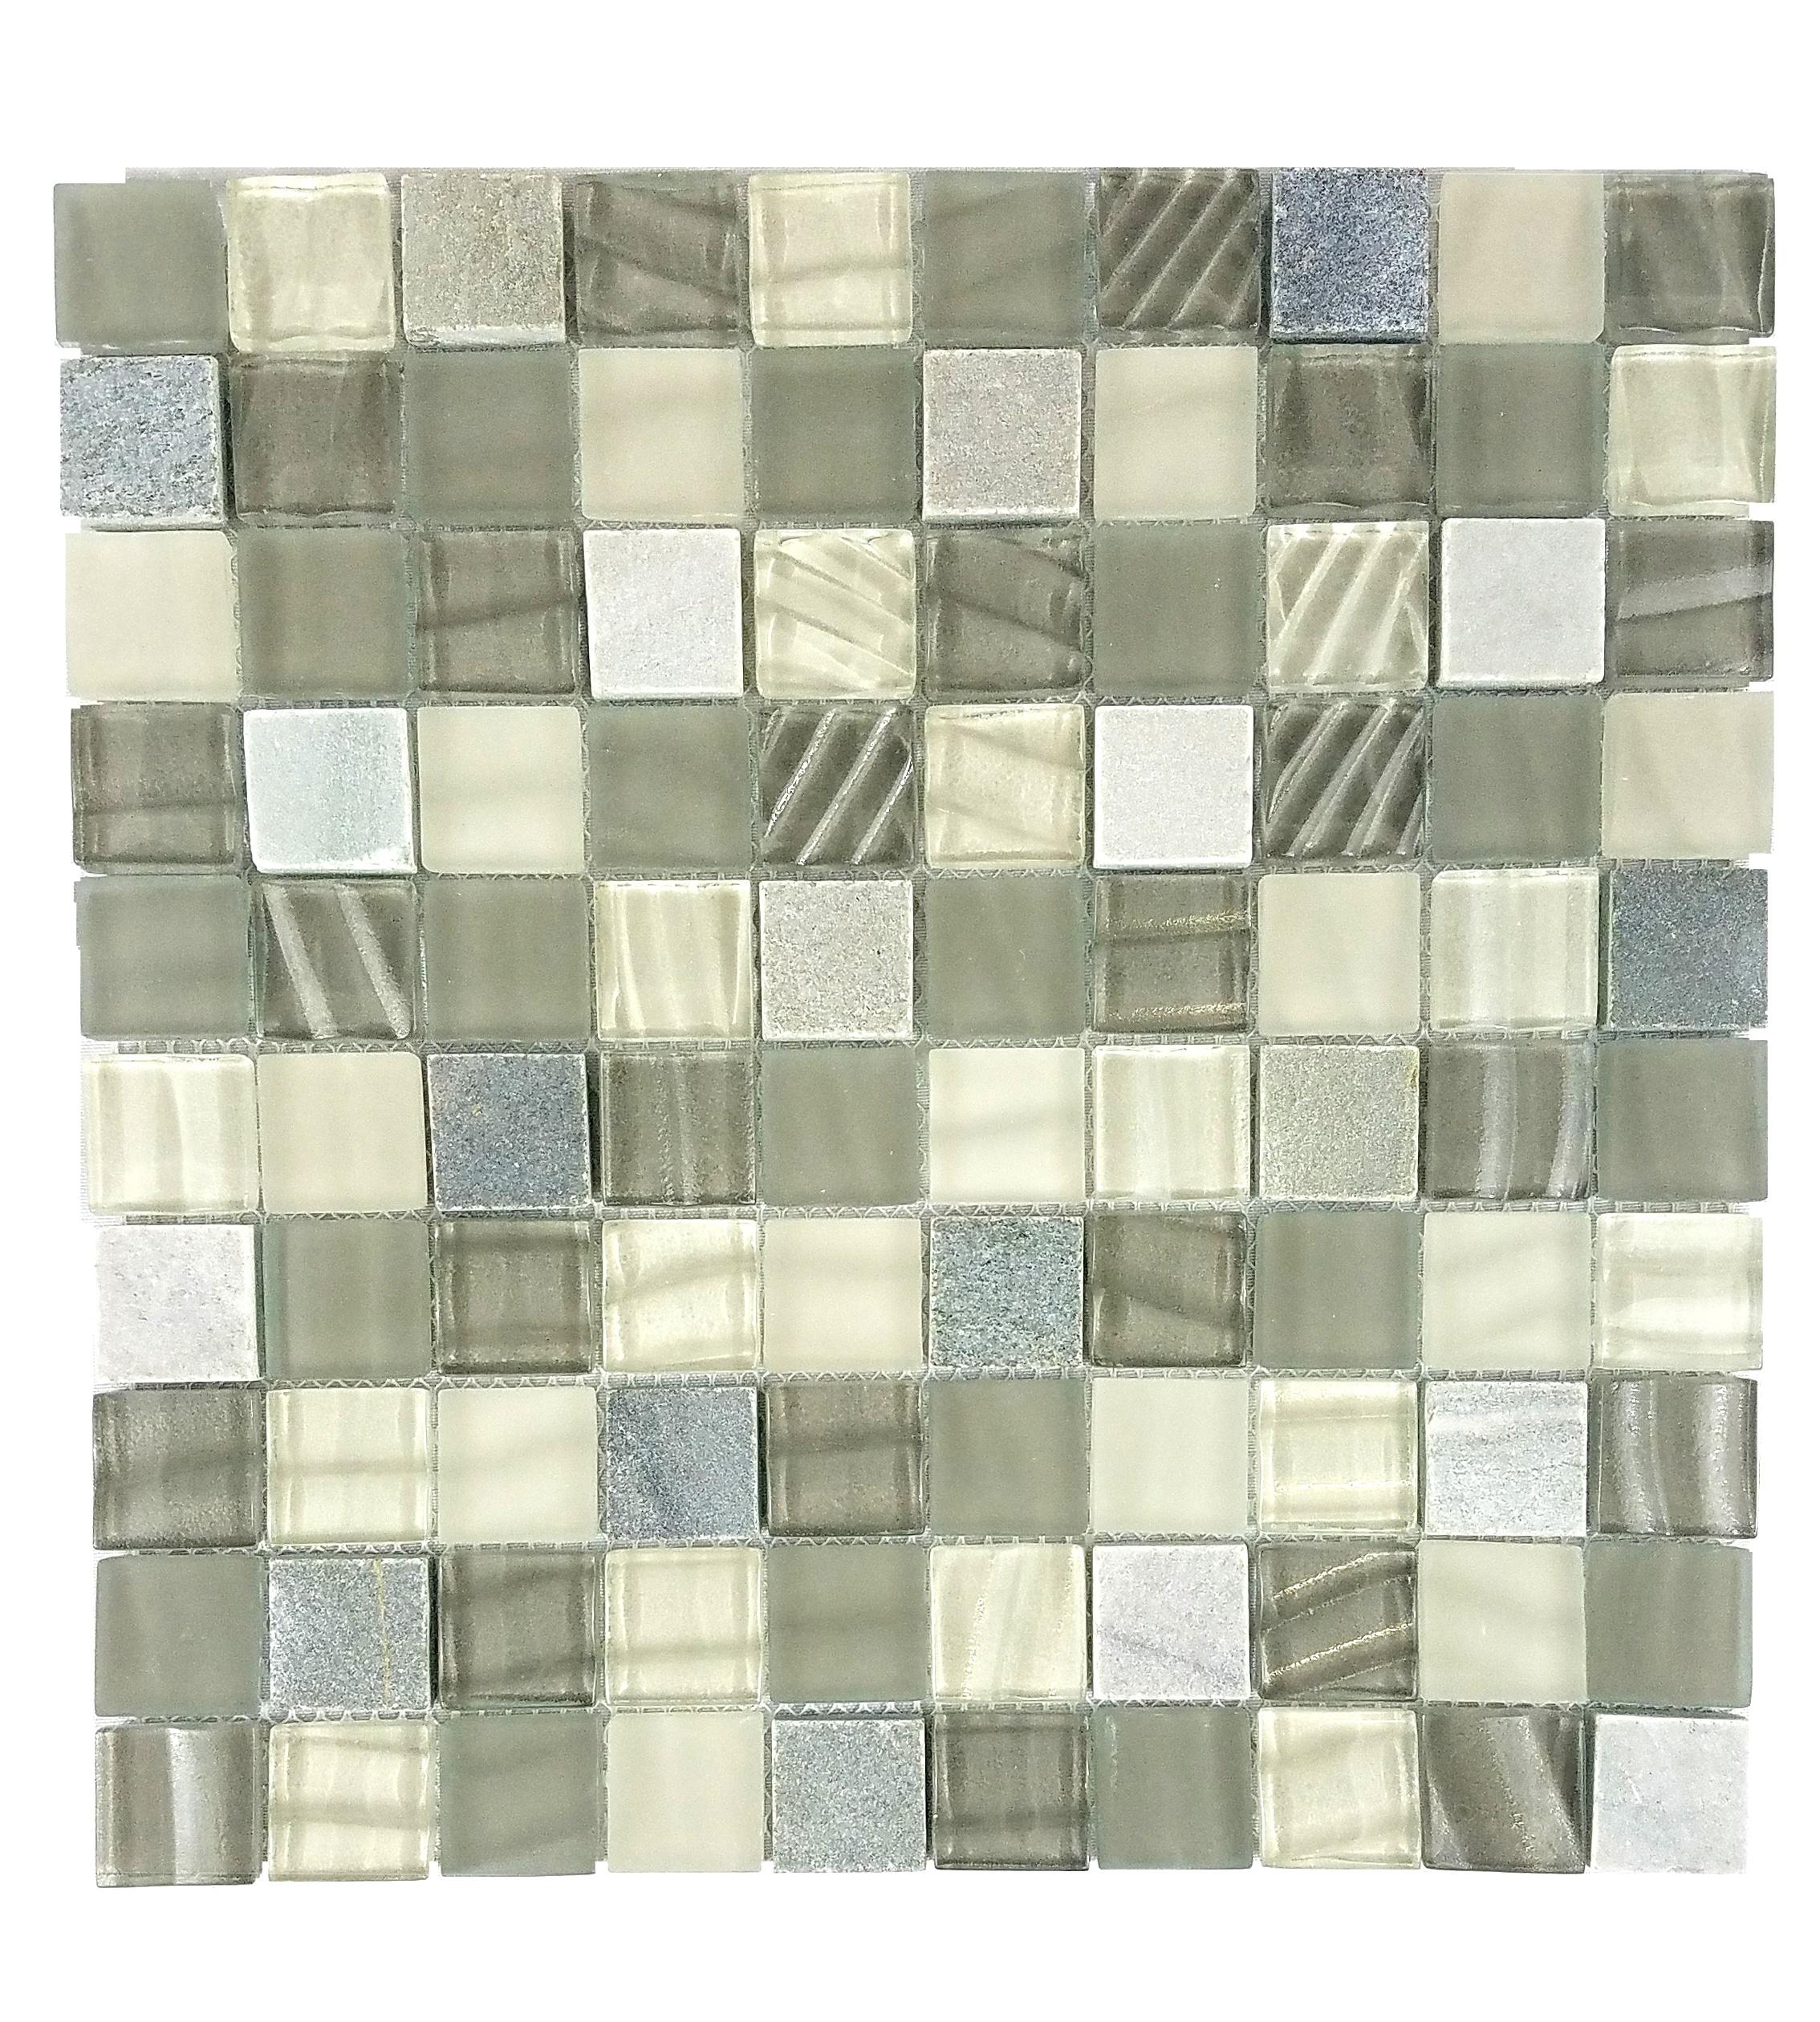 "New Era II 1"" x 1"" Multi Finish Gray Glass and Stone Square Backsplash Mosaic Wall & Floor Tile"